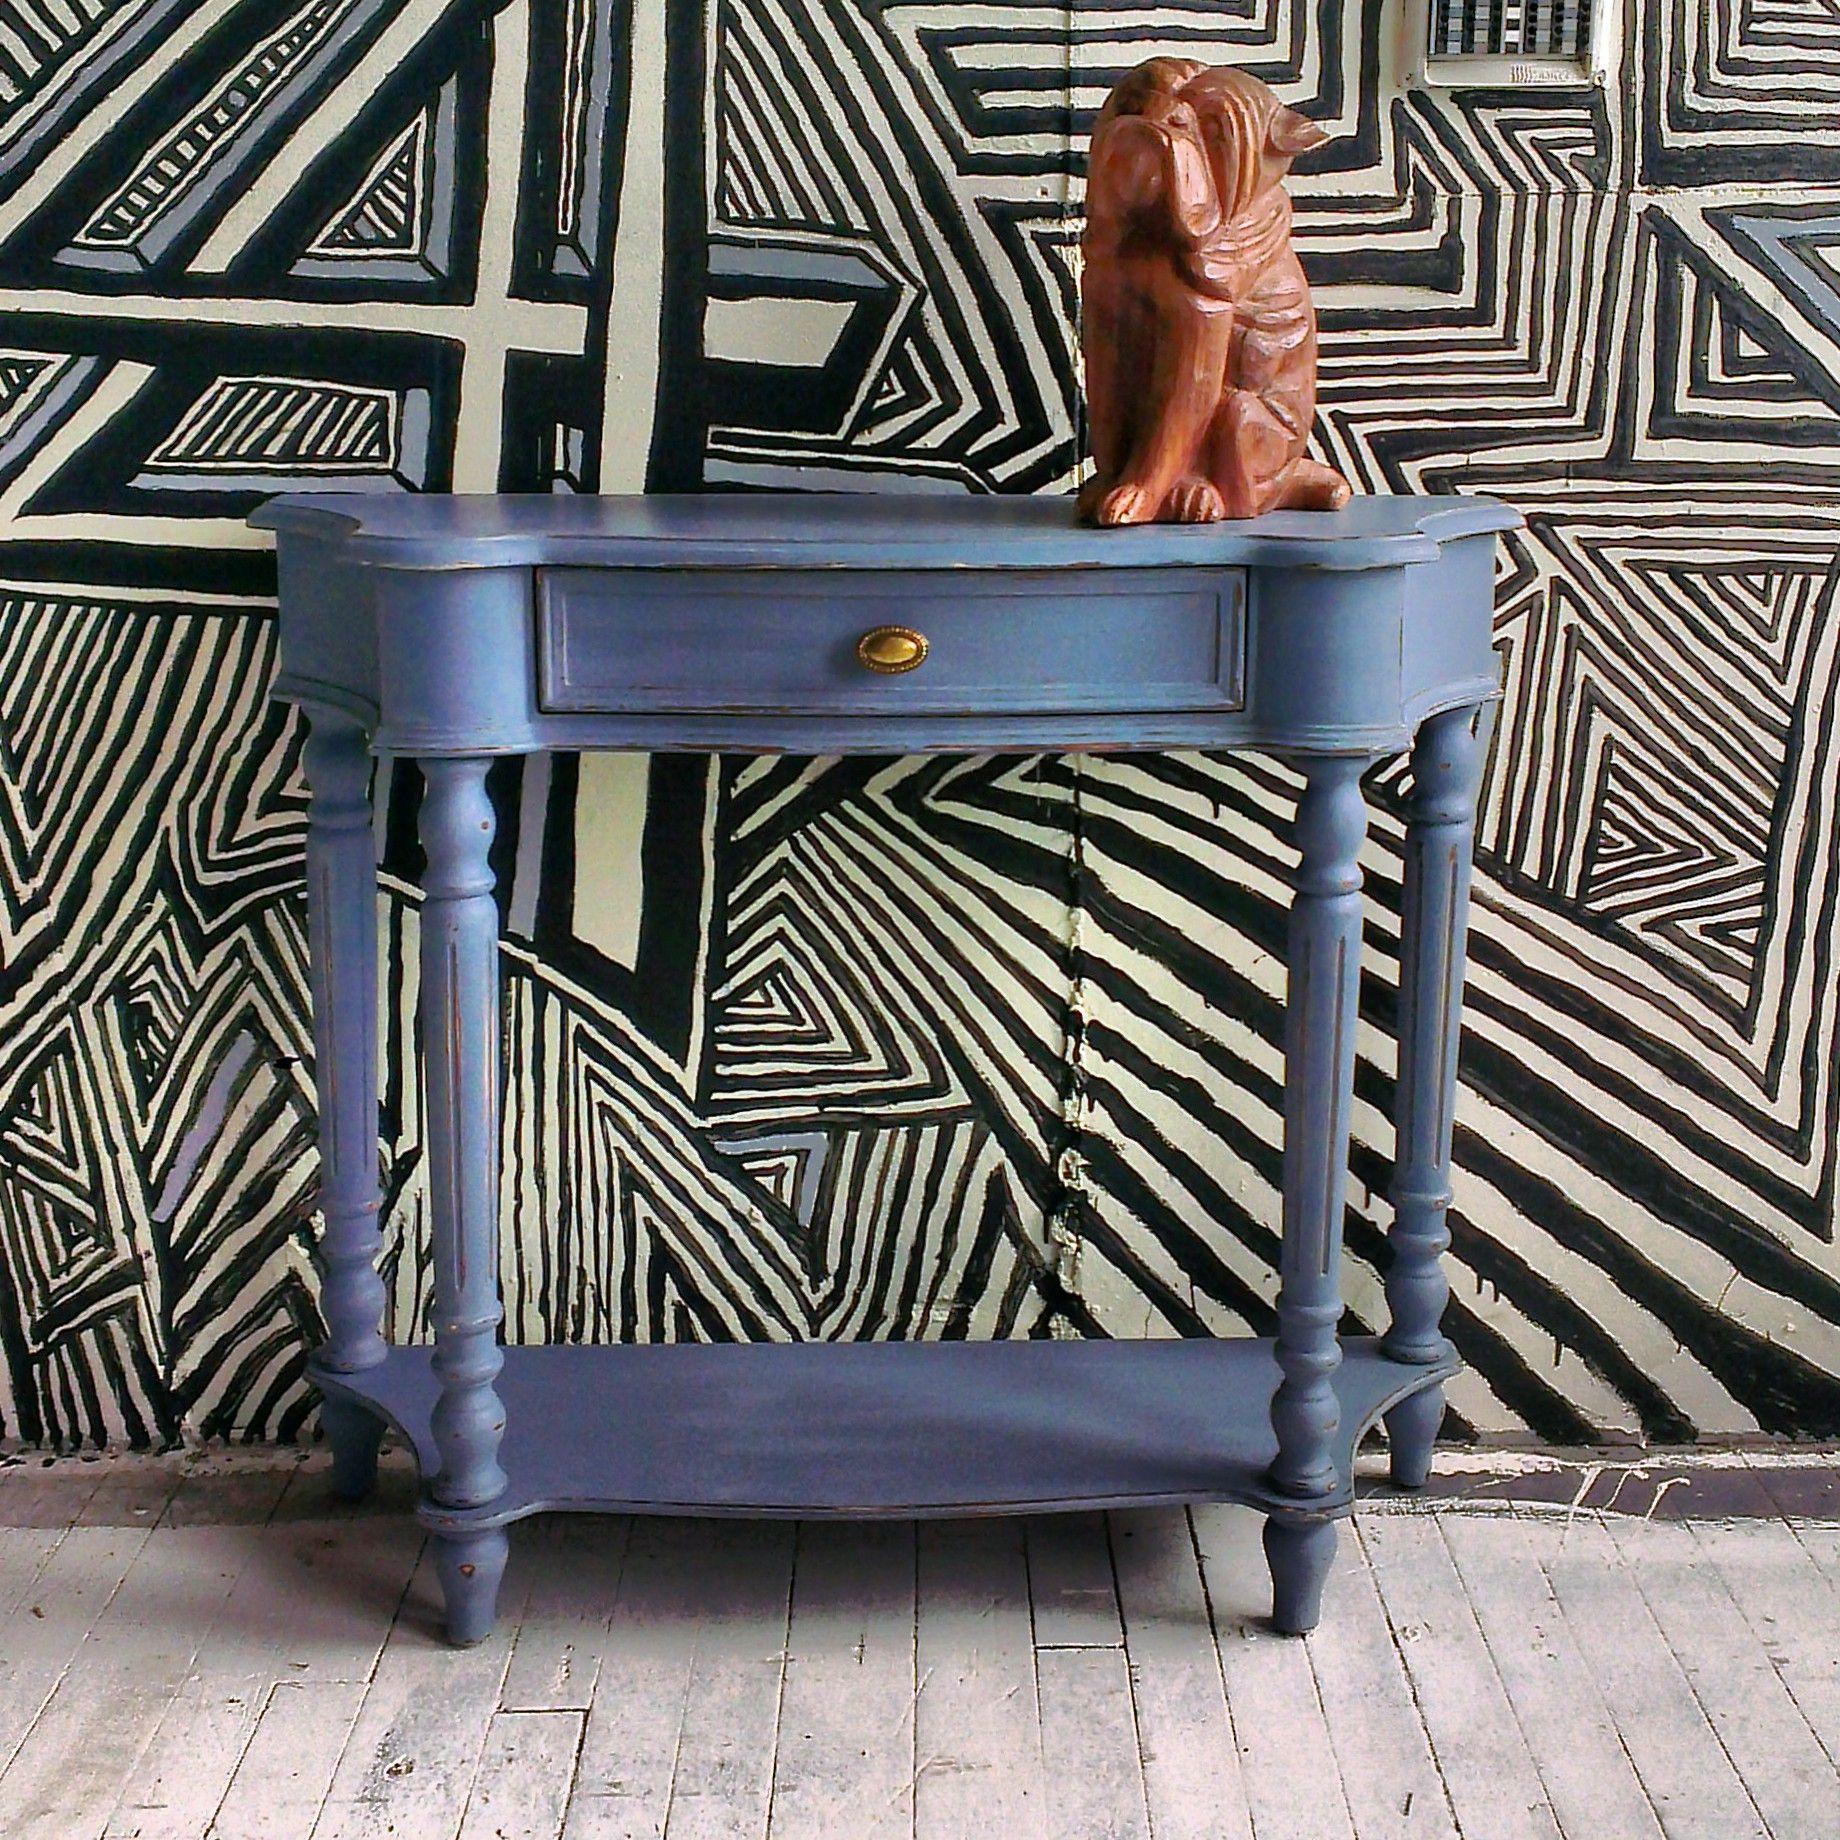 console sydney bulldog donavan rehauss la peinture la craie cr ations mixxy design. Black Bedroom Furniture Sets. Home Design Ideas